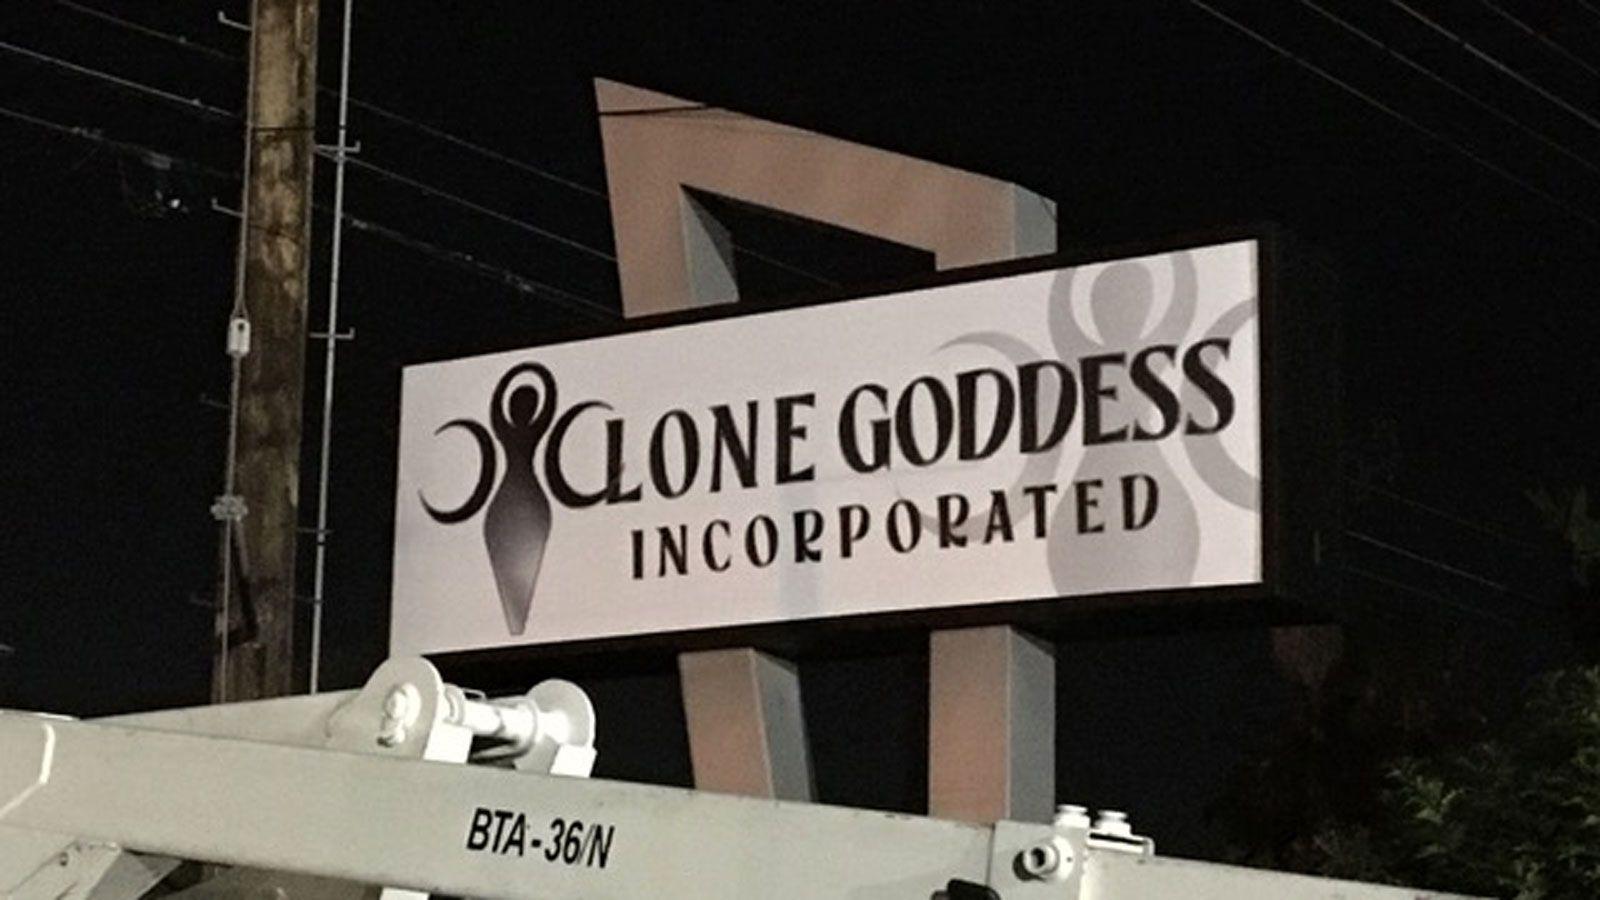 Lone Goddess light box